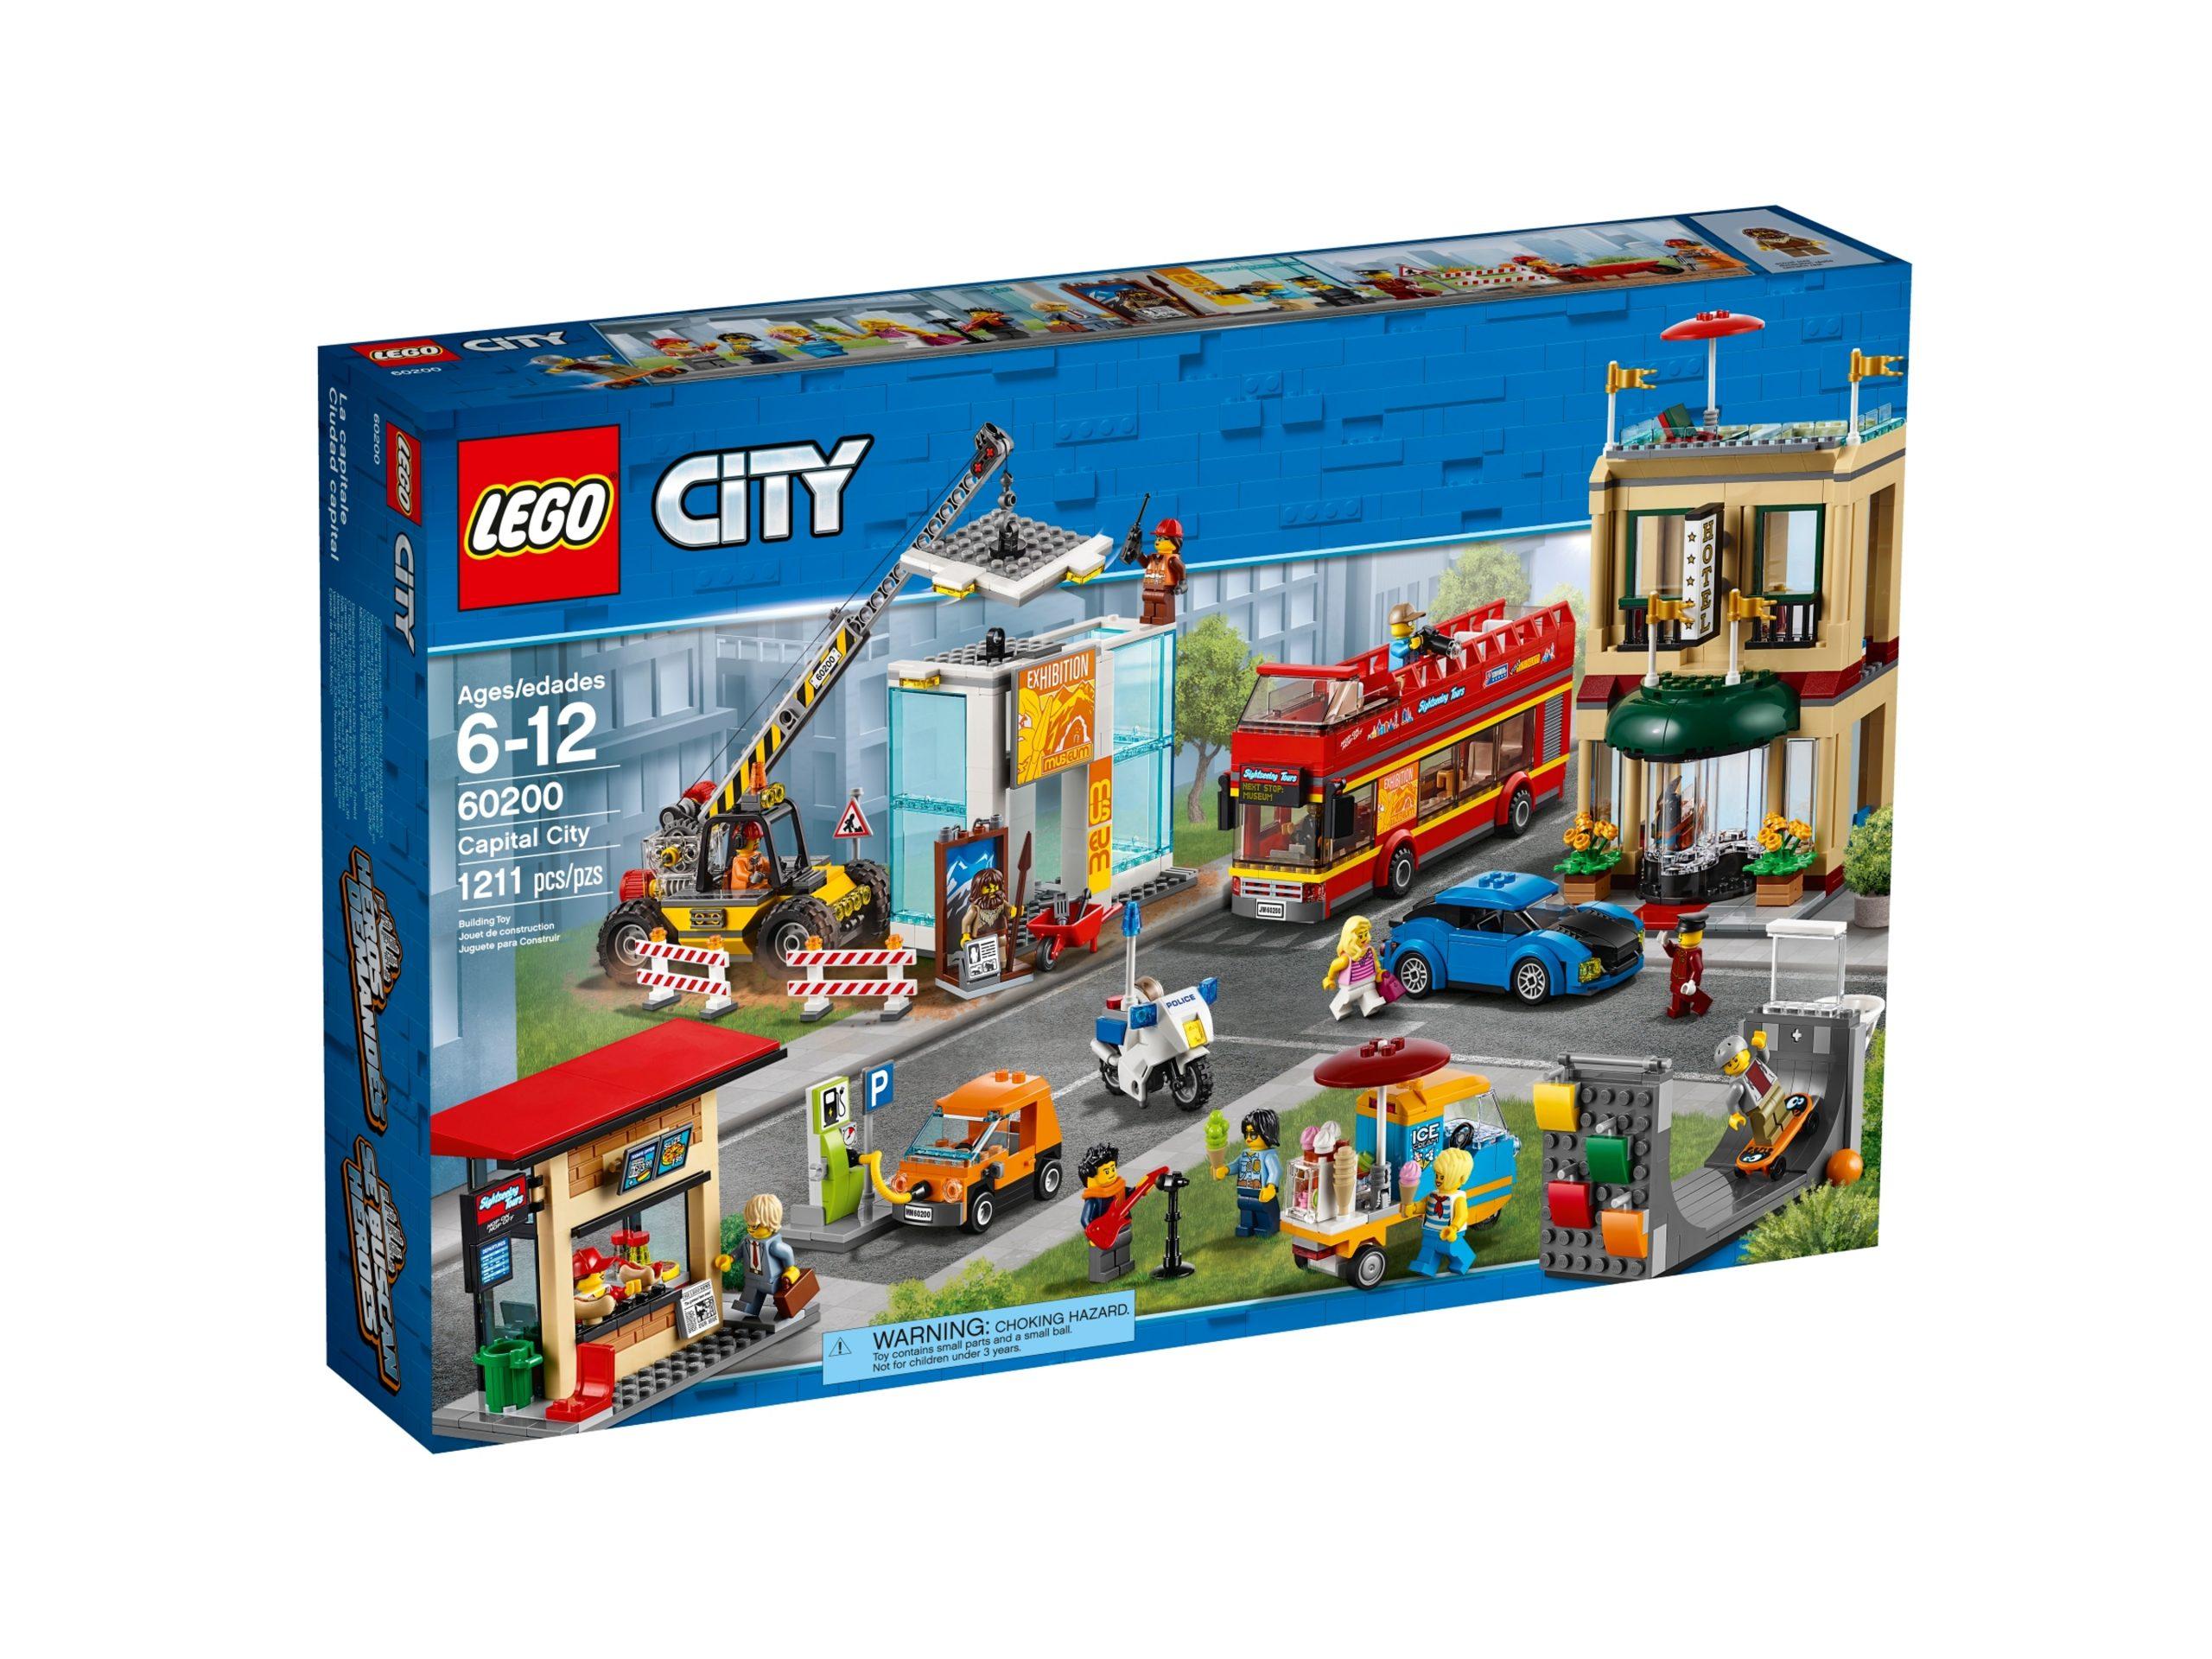 lego 60200 la capitale di city scaled